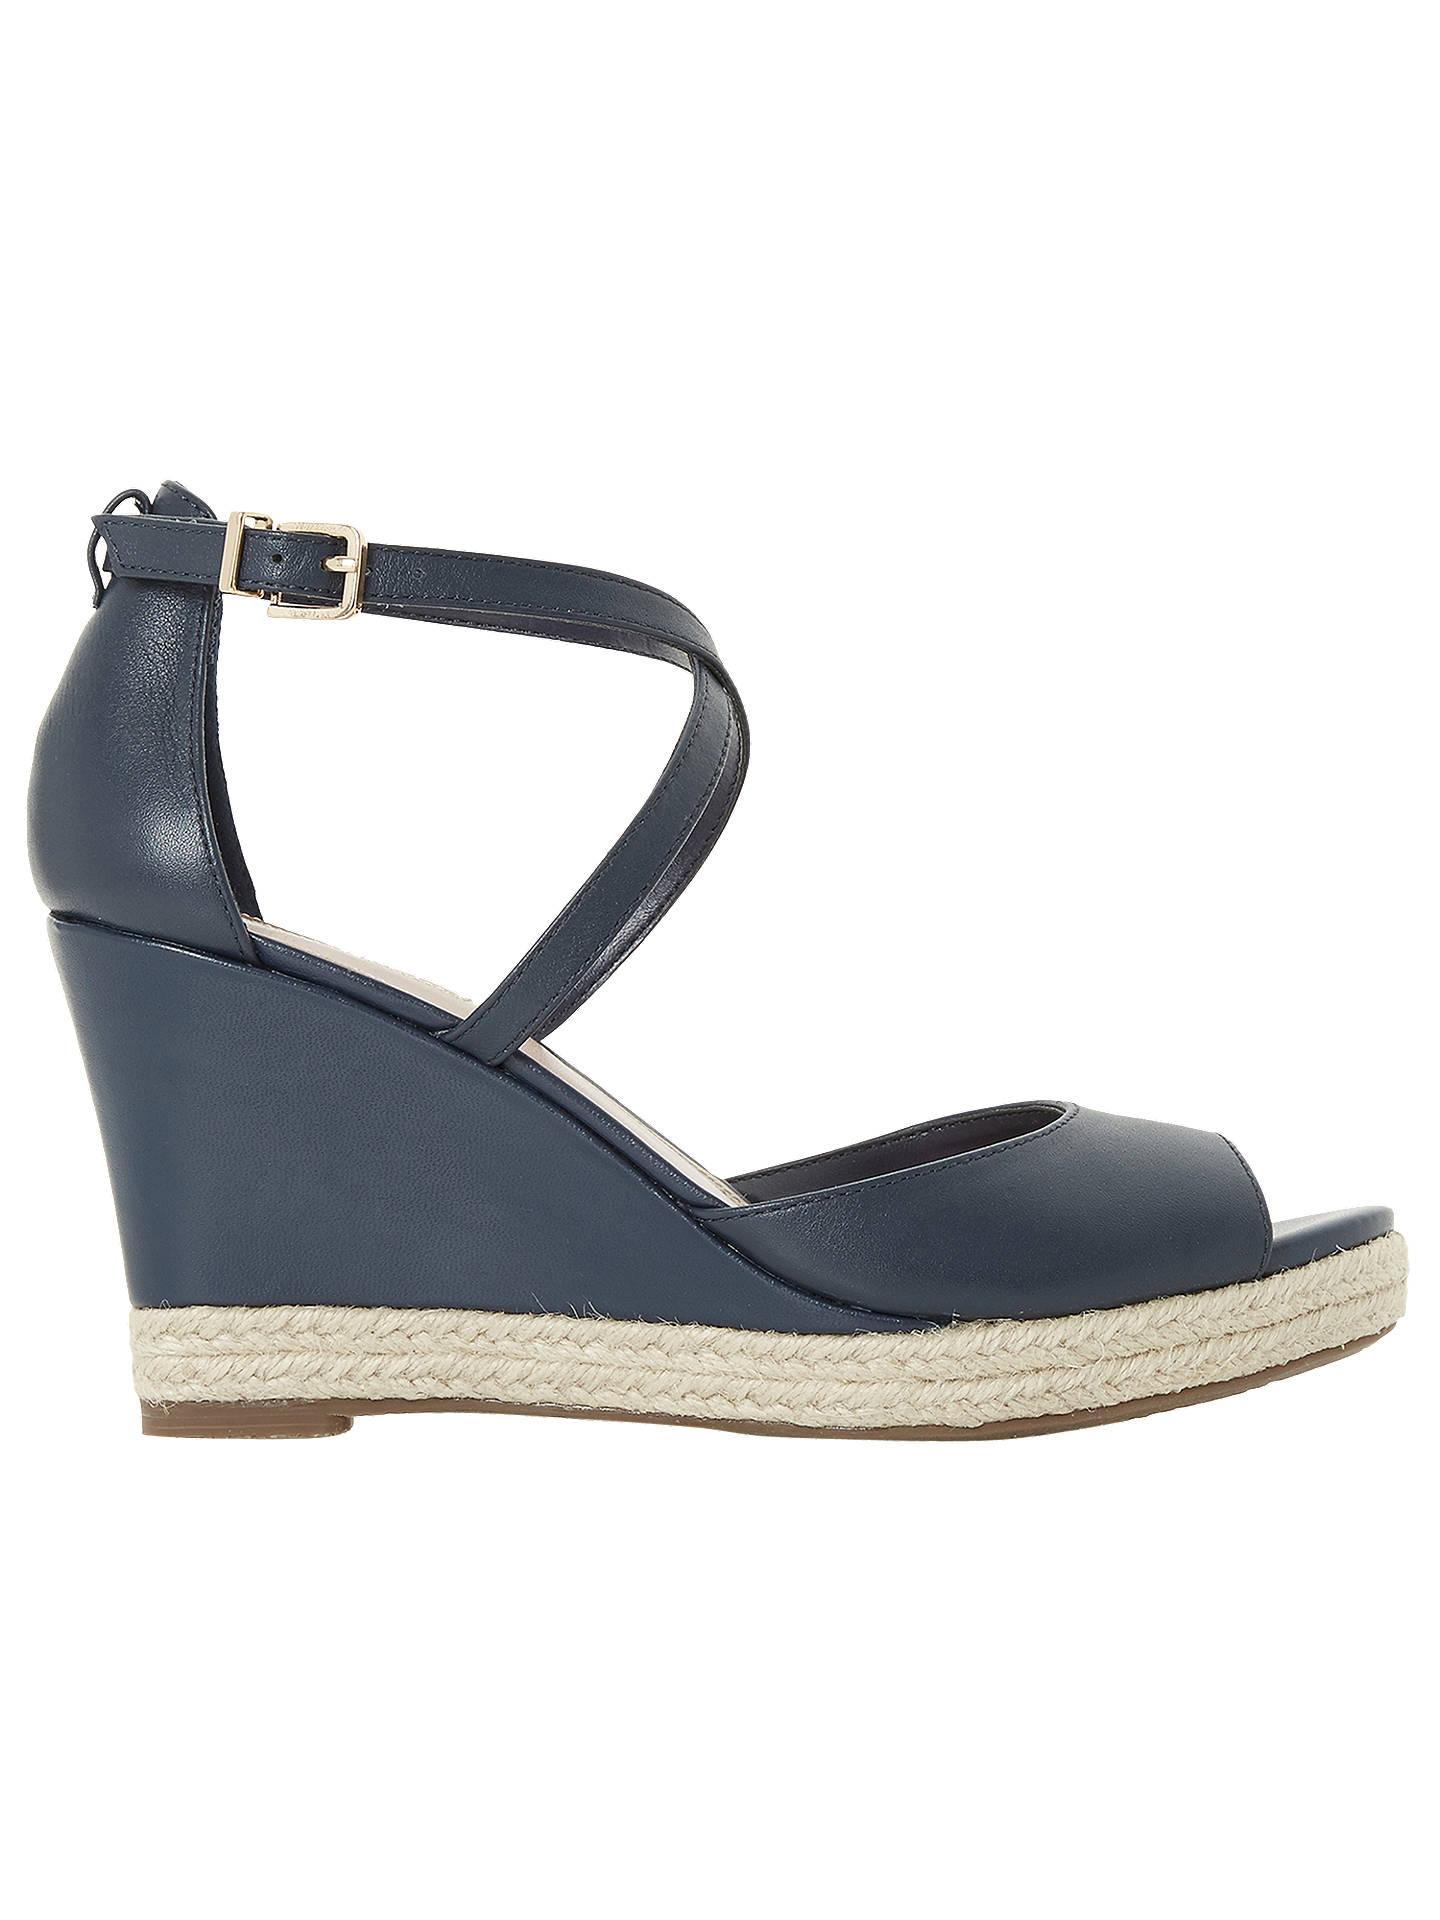 f218b0bd8 Buy Dune Kestrel Cross Strap Wedge Sandals, Navy Leather, 3 Online at  johnlewis.